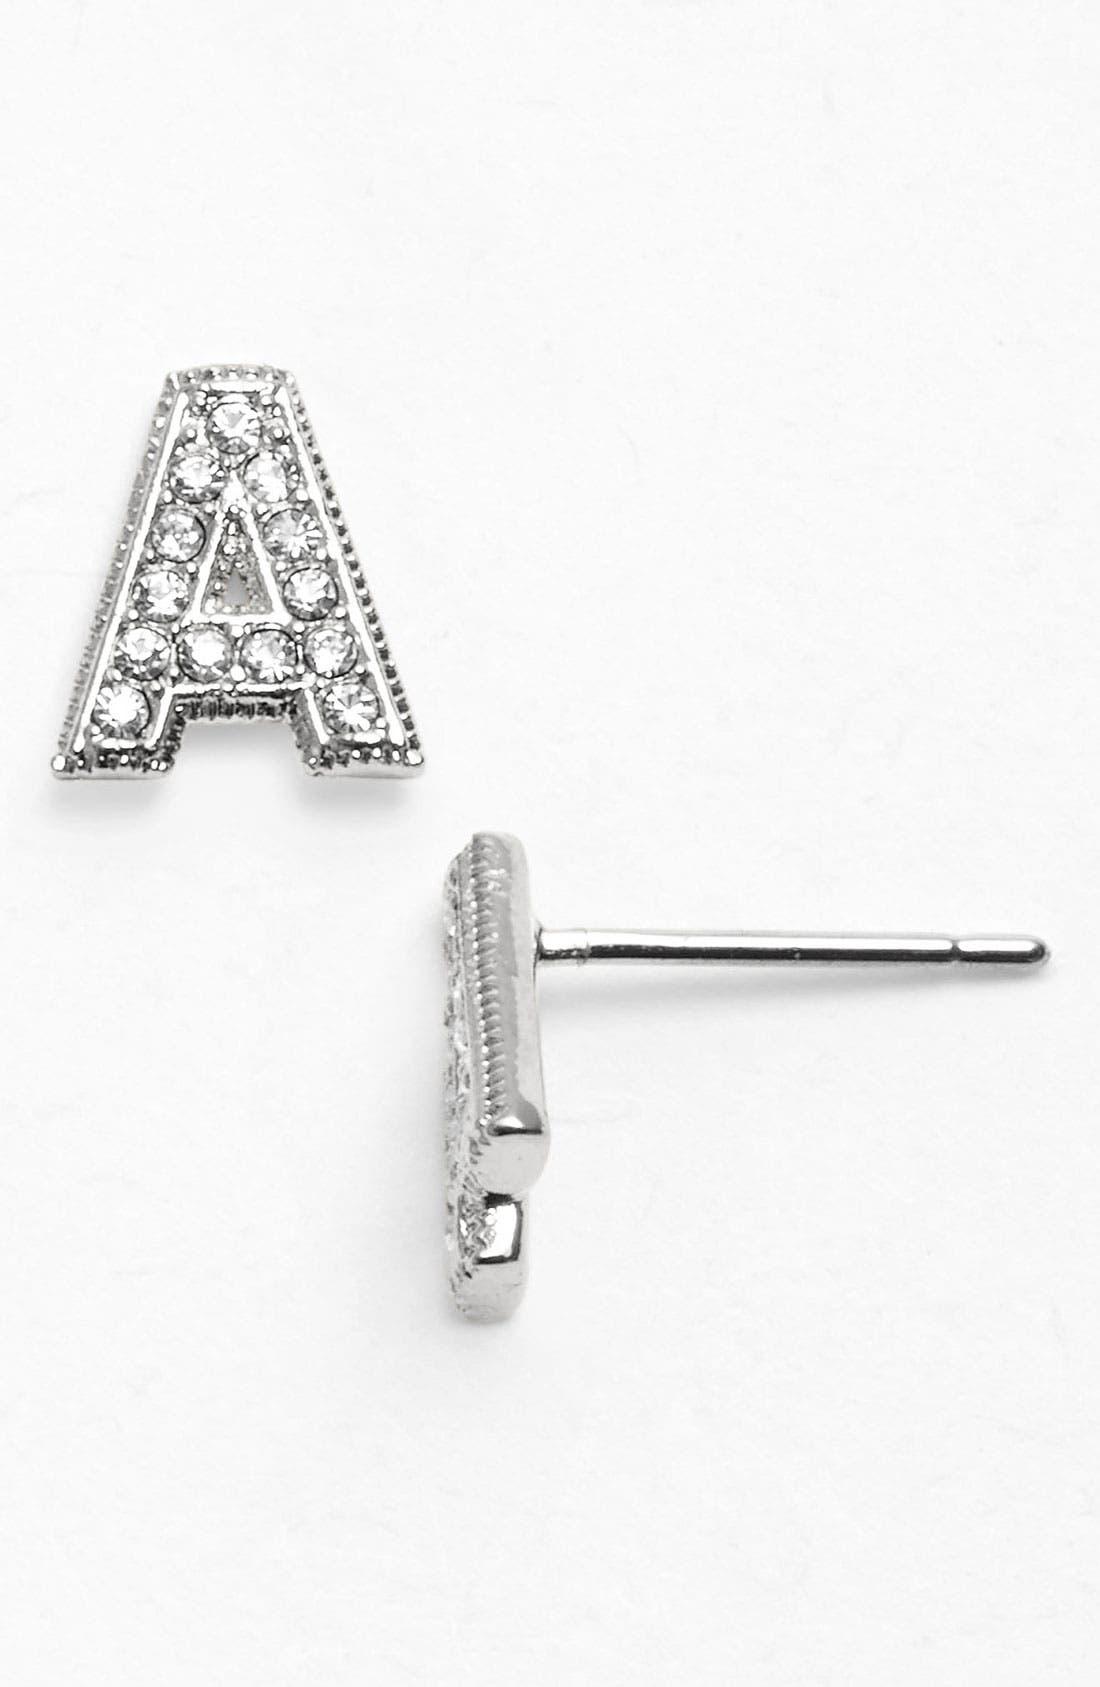 Alternate Image 1 Selected - Nadri 'Novelty' Initial Stud Earrings (Nordstrom Exclusive)